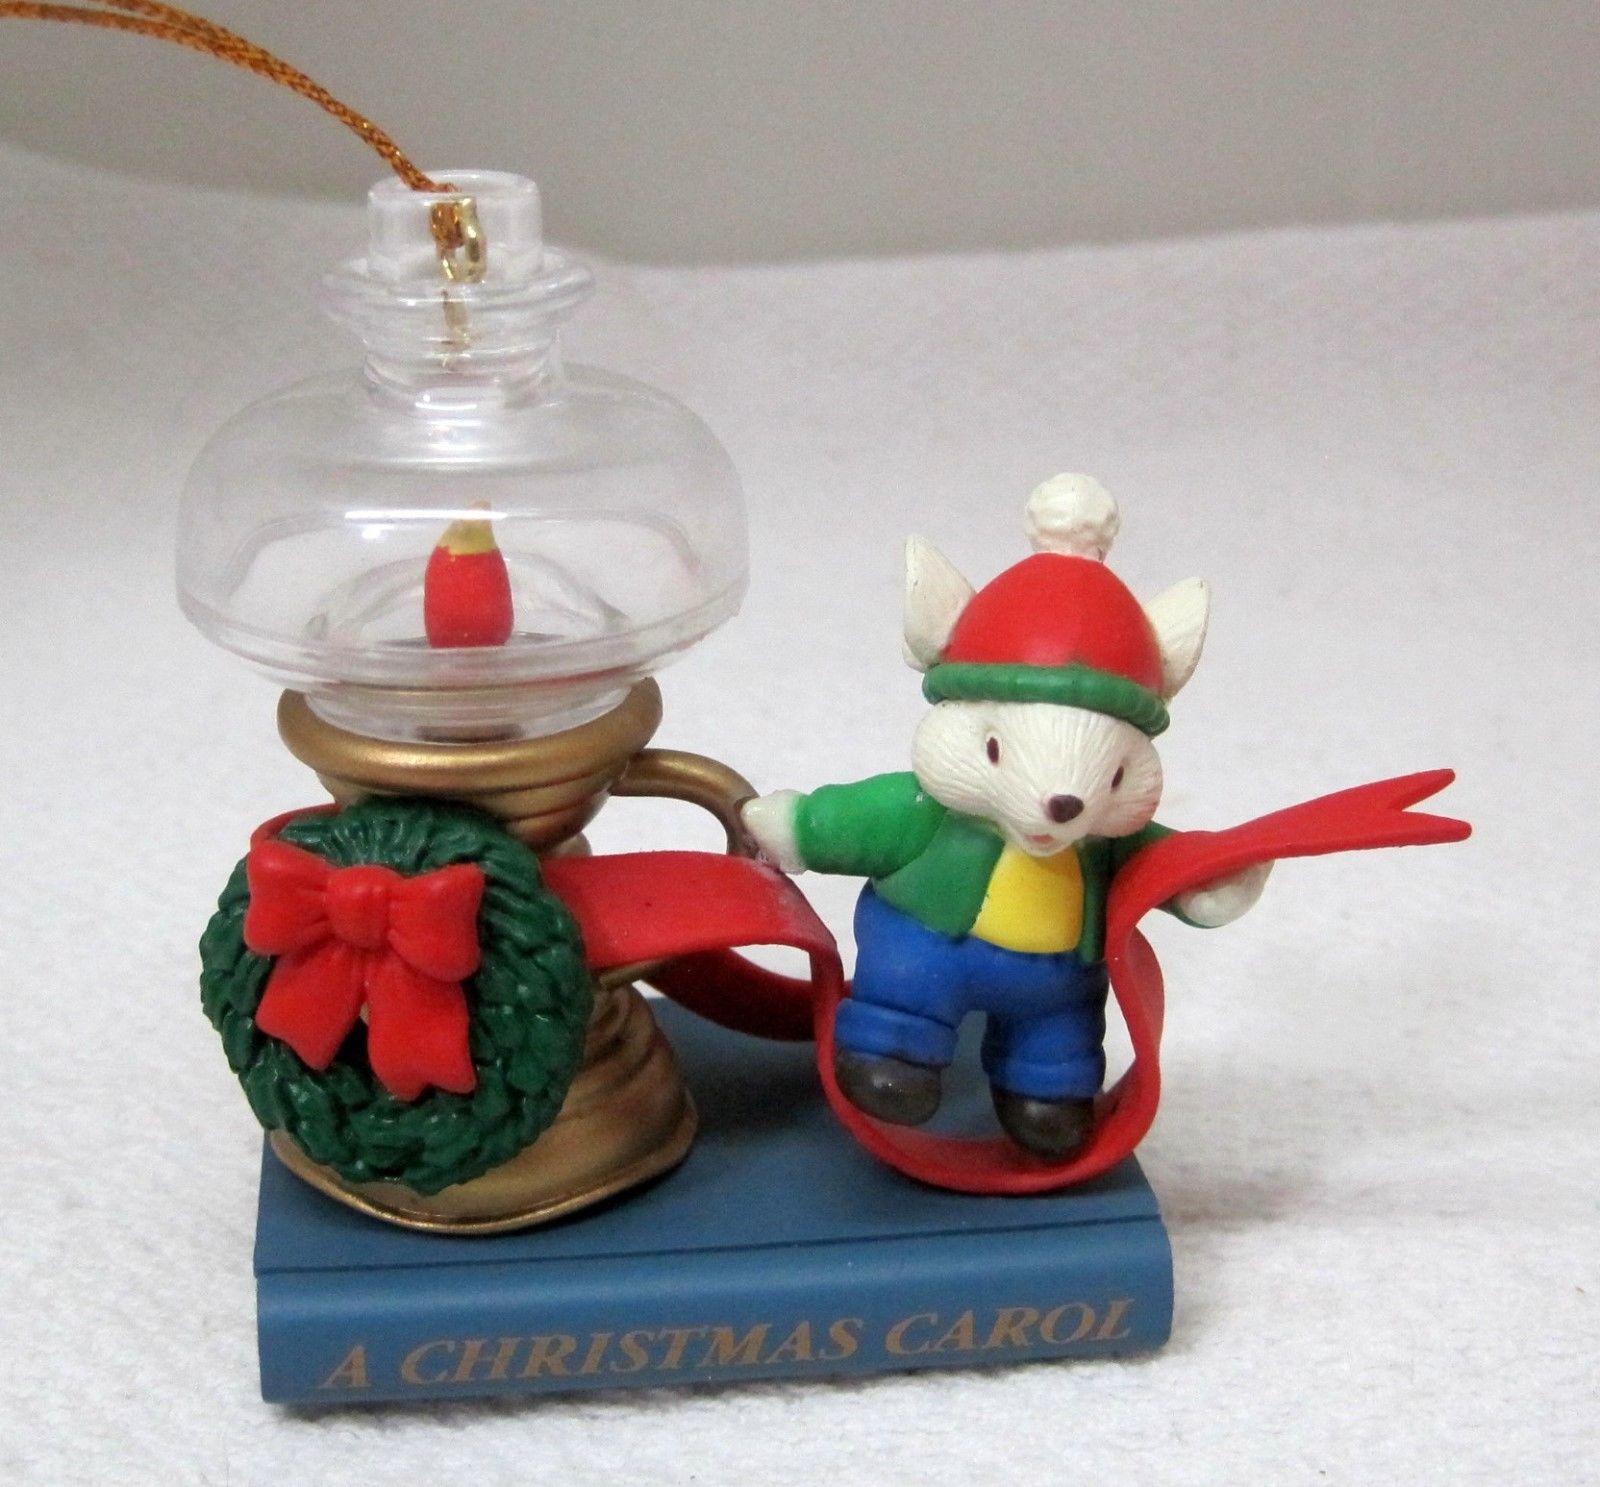 1997 Westmar A Christmas Carol Mouse Lamp Tree Ornament Older NICE!  T101